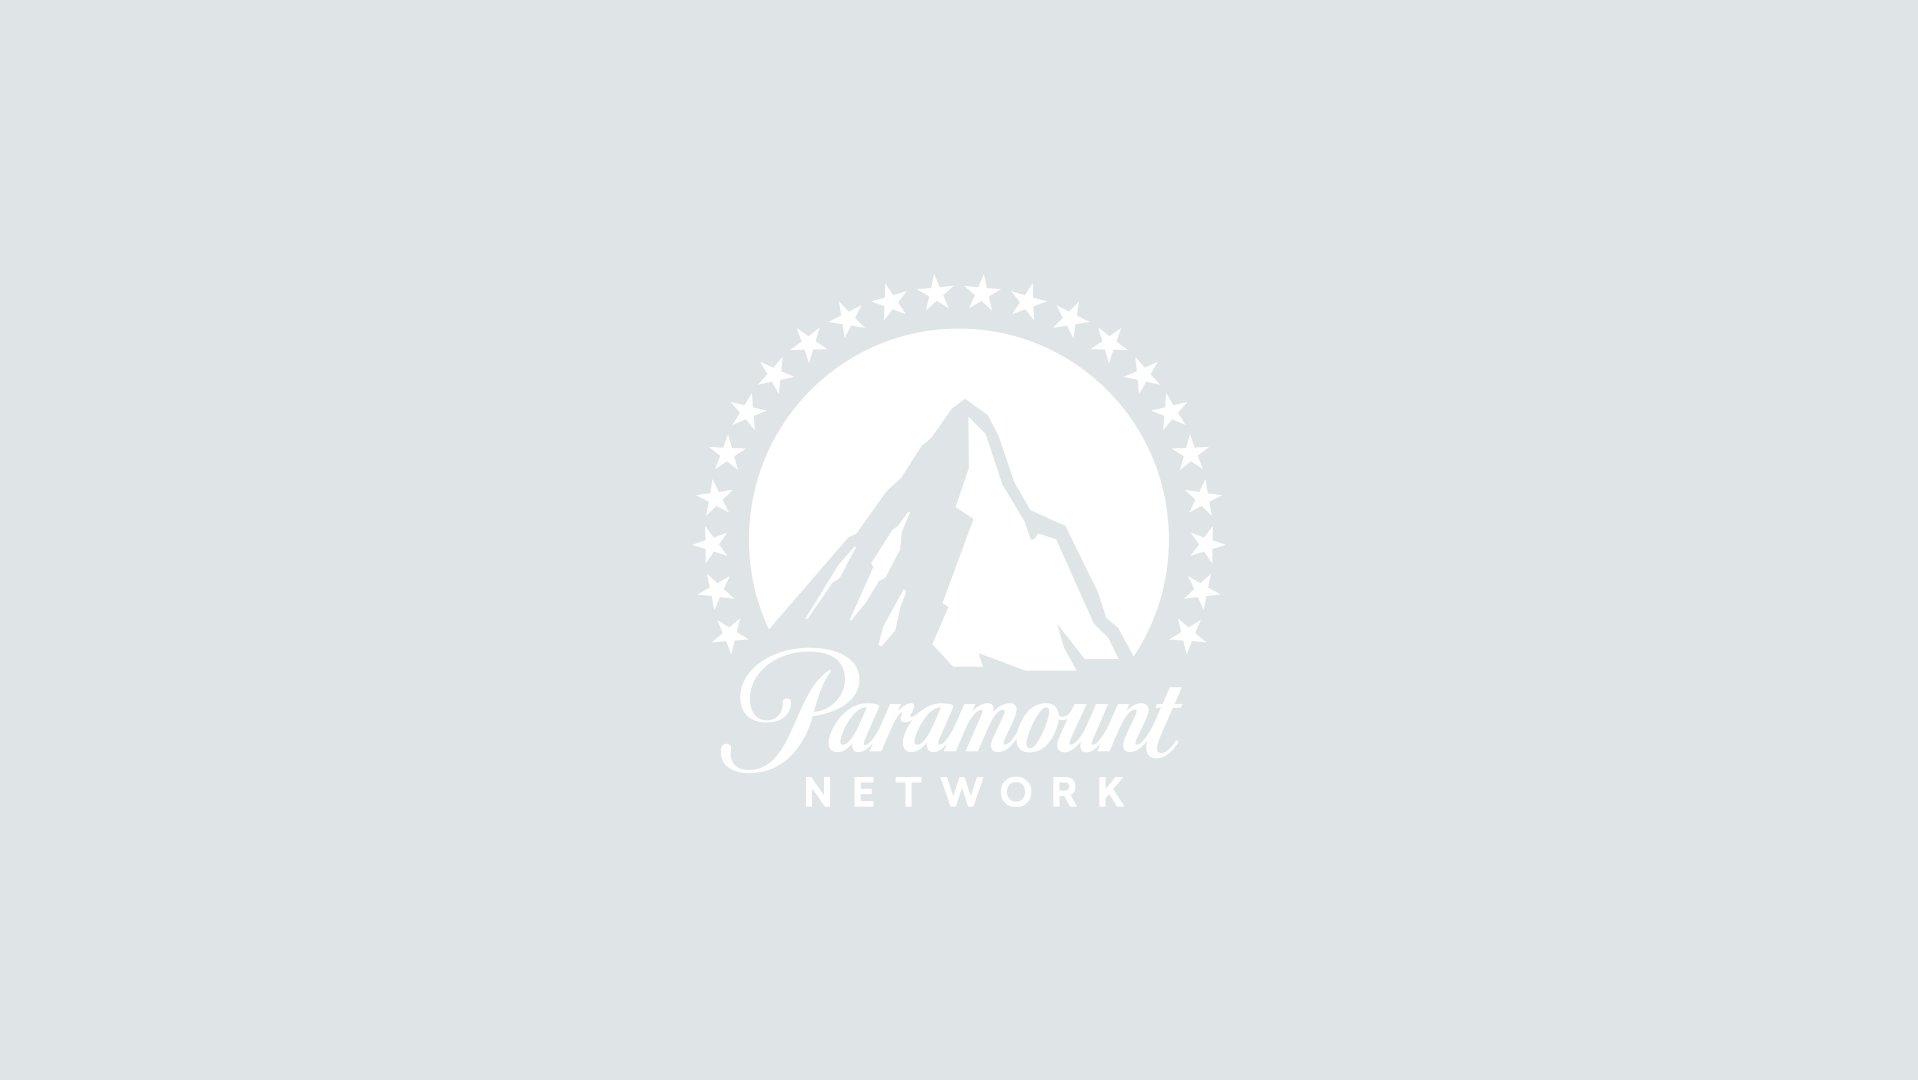 Tony Goldwyn, foto: Getty Images